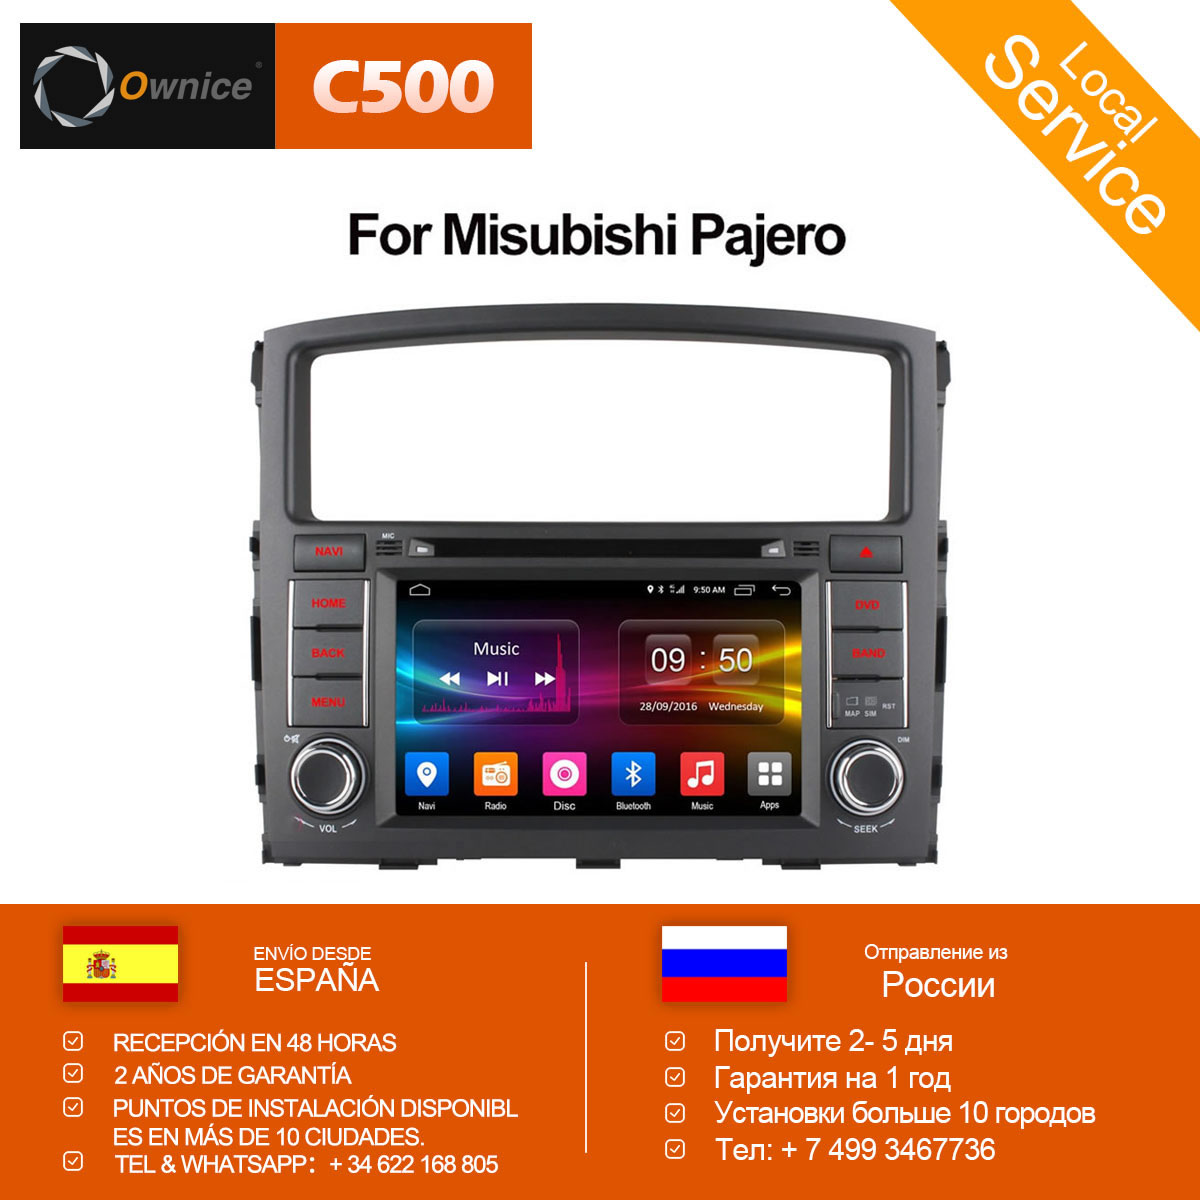 Ownice C500 Octa 8 Core Android 6.0 Per MITSUBISHI PAJERO V97 V93 2006-2015 Car DVD Player GPS Navi supporto 4g DAB + TPMS 32g ROM